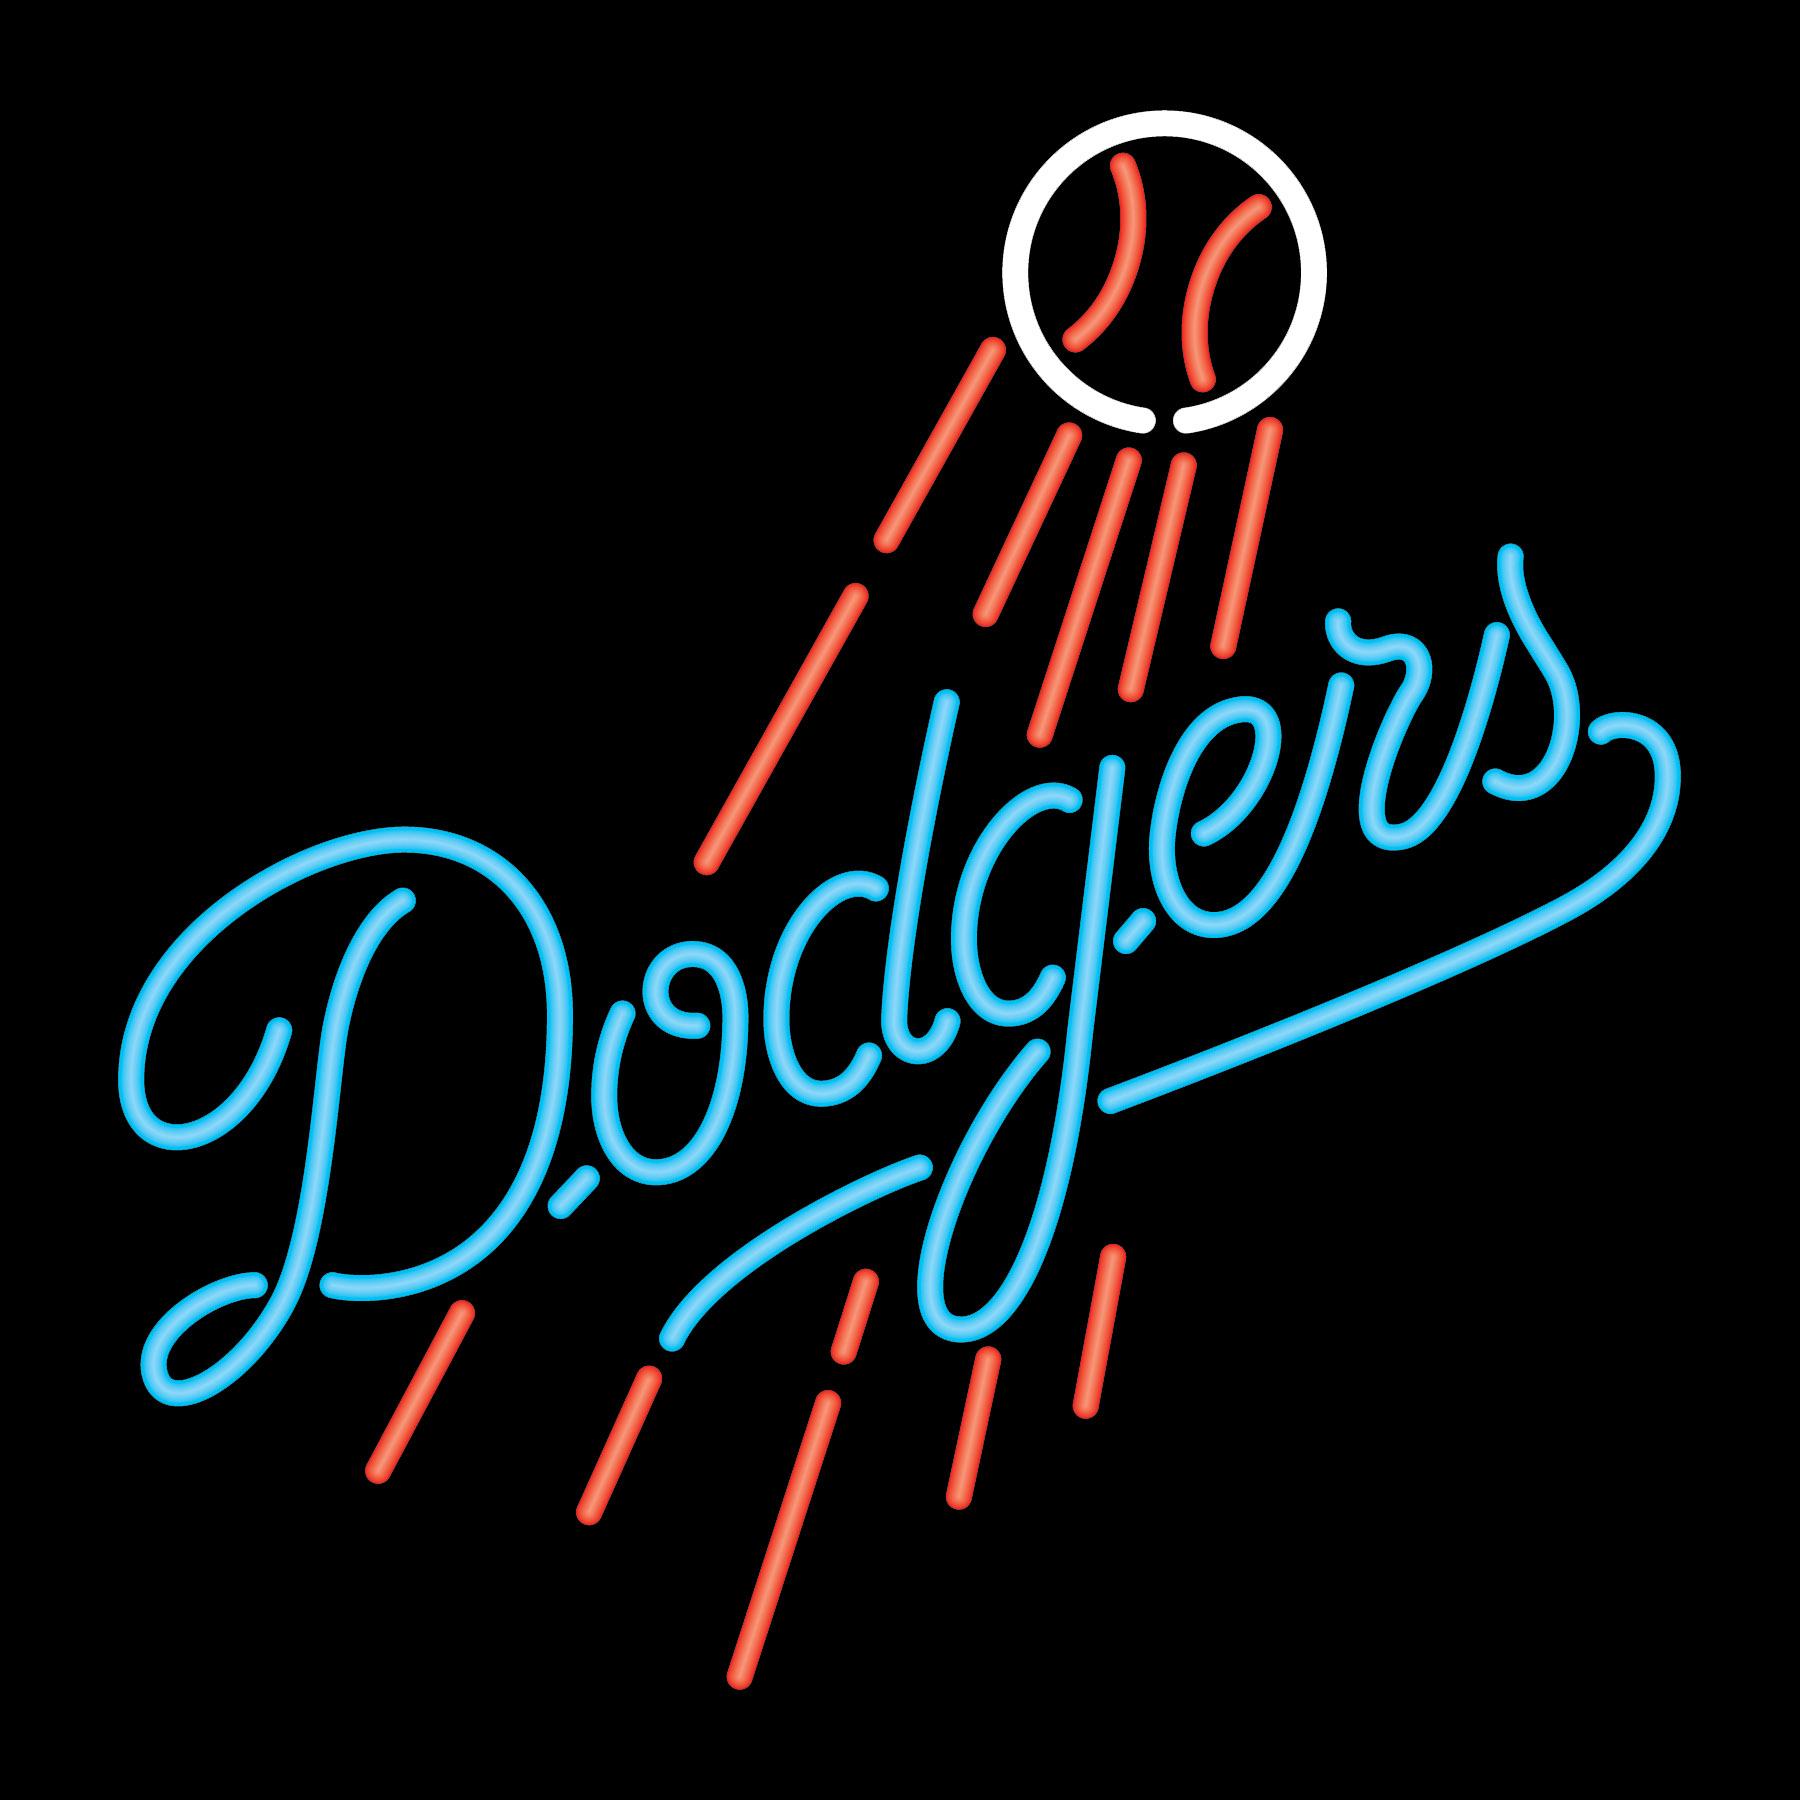 Los Angeles Dodgers Baseball Mlb T Wallpaper 1800x1800 158560 Wallpaperup